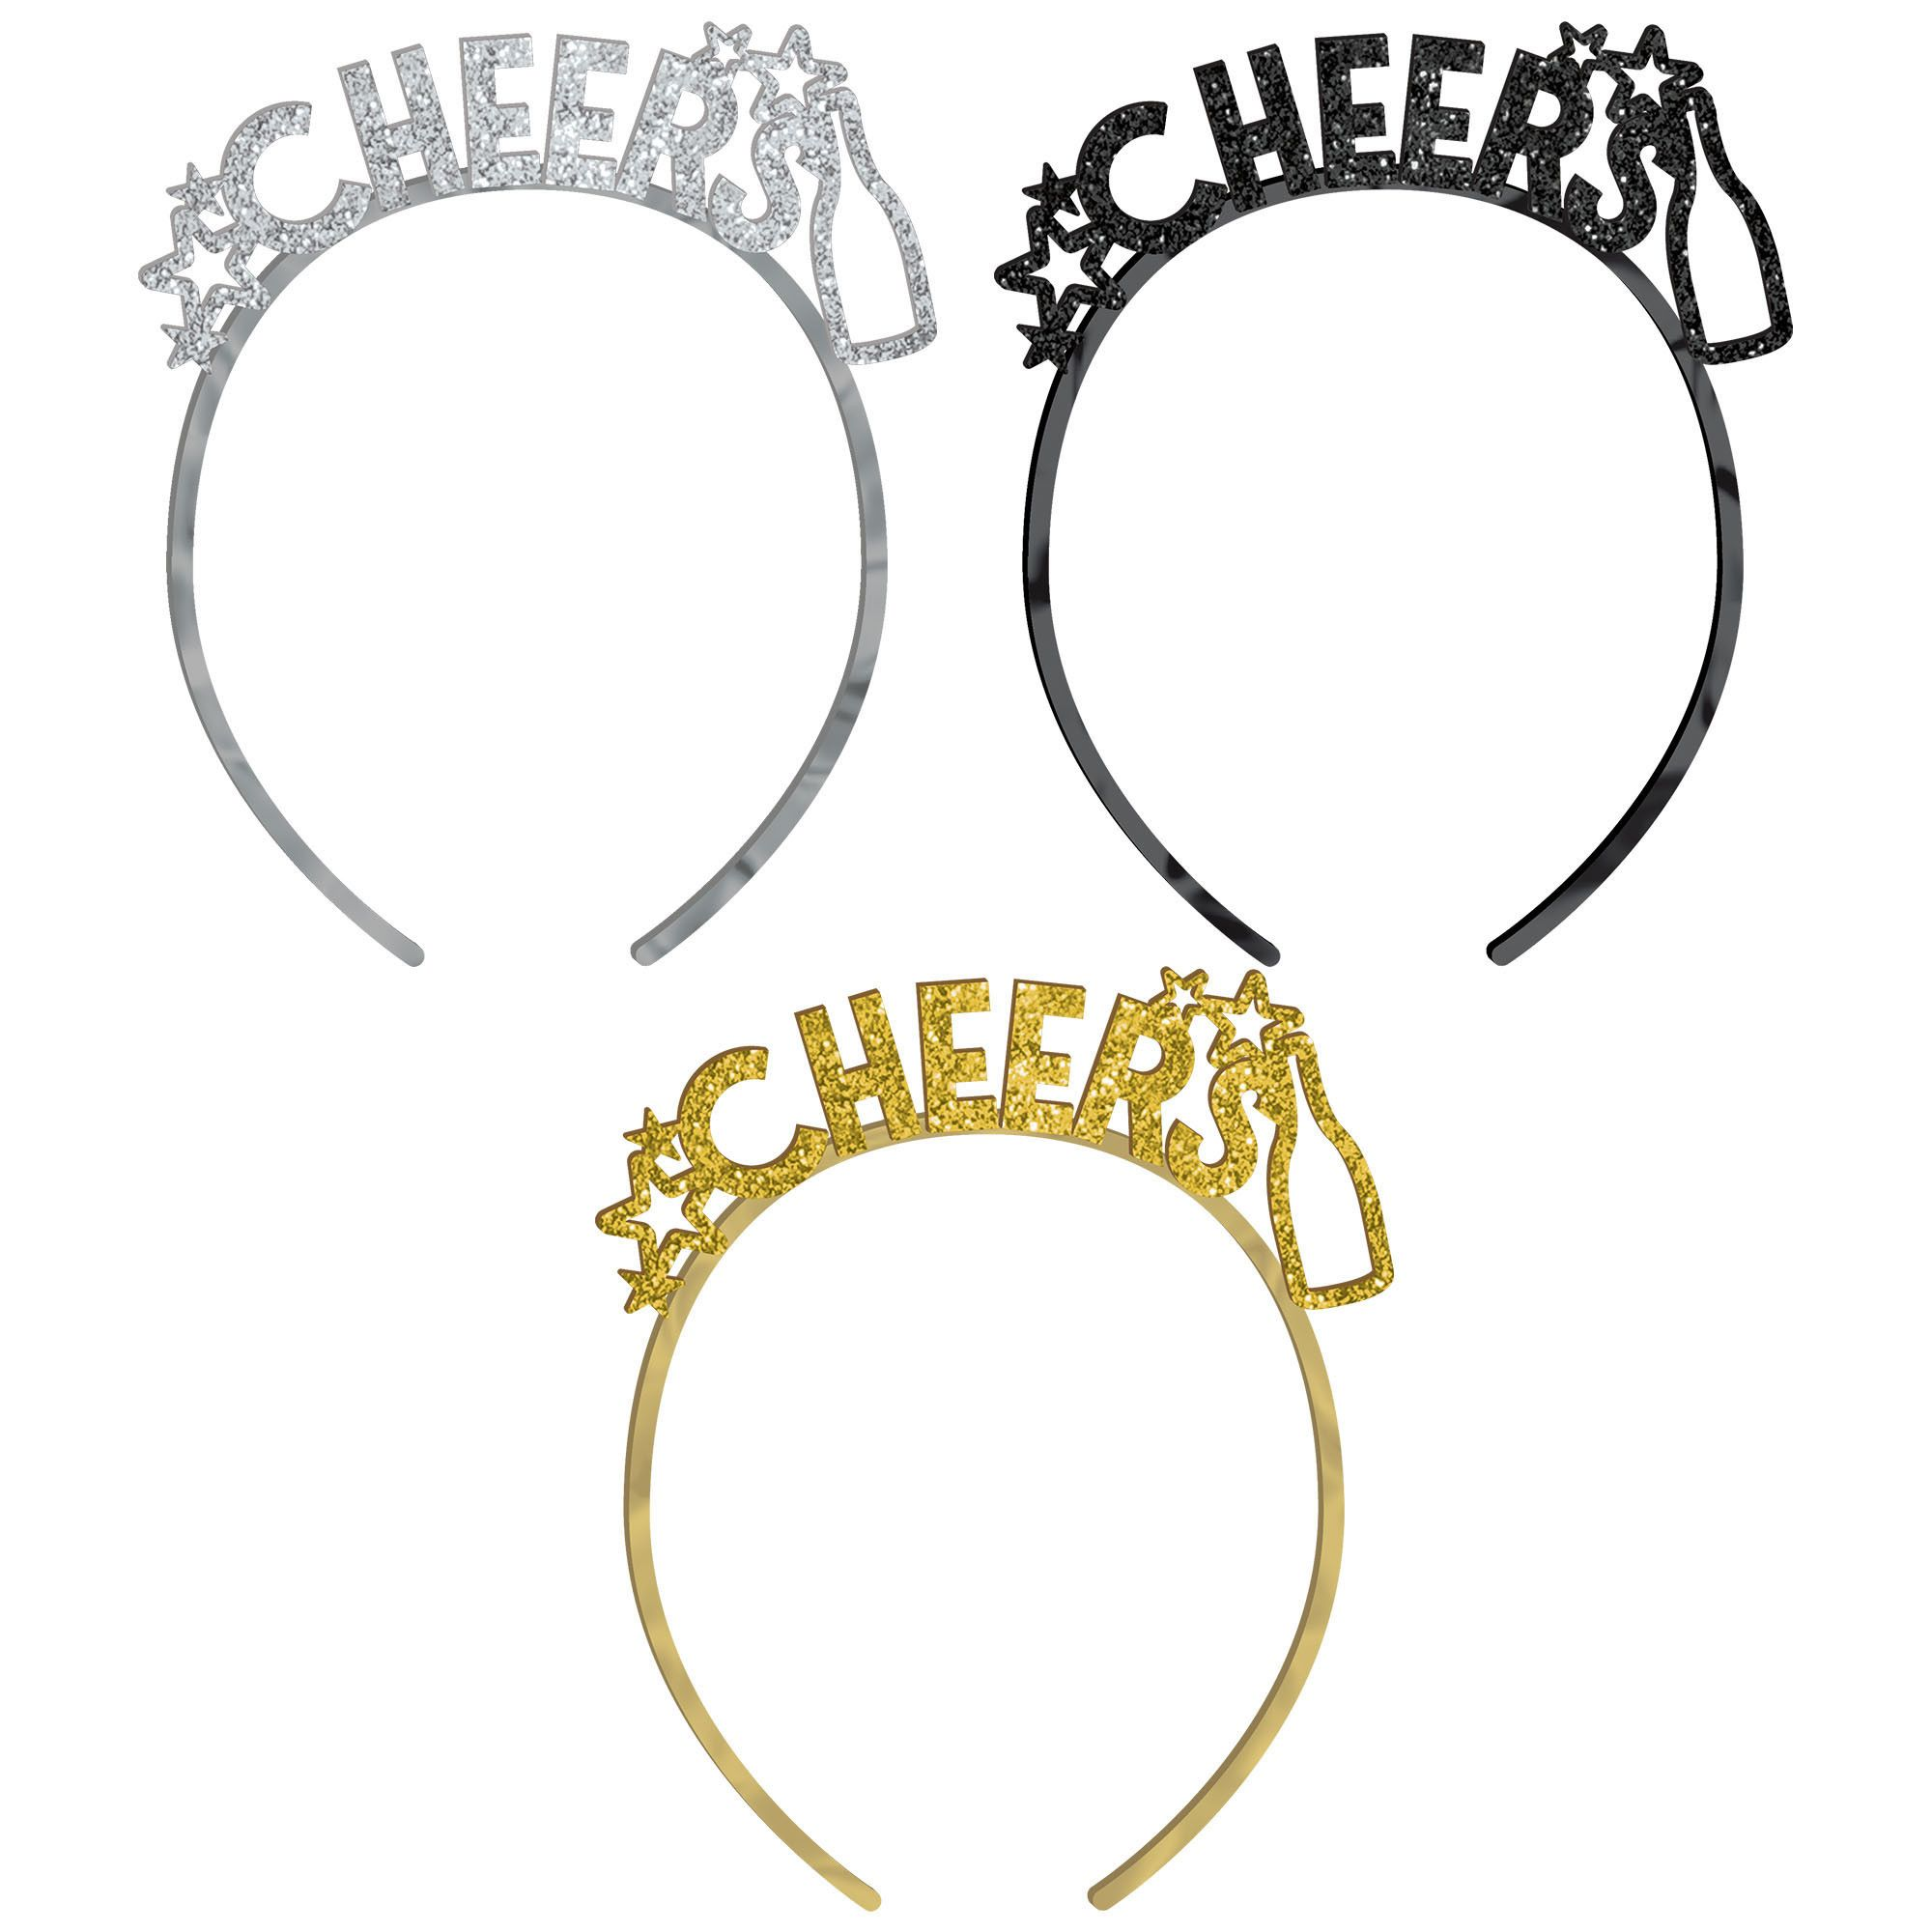 NY BSG Plastic Headbands